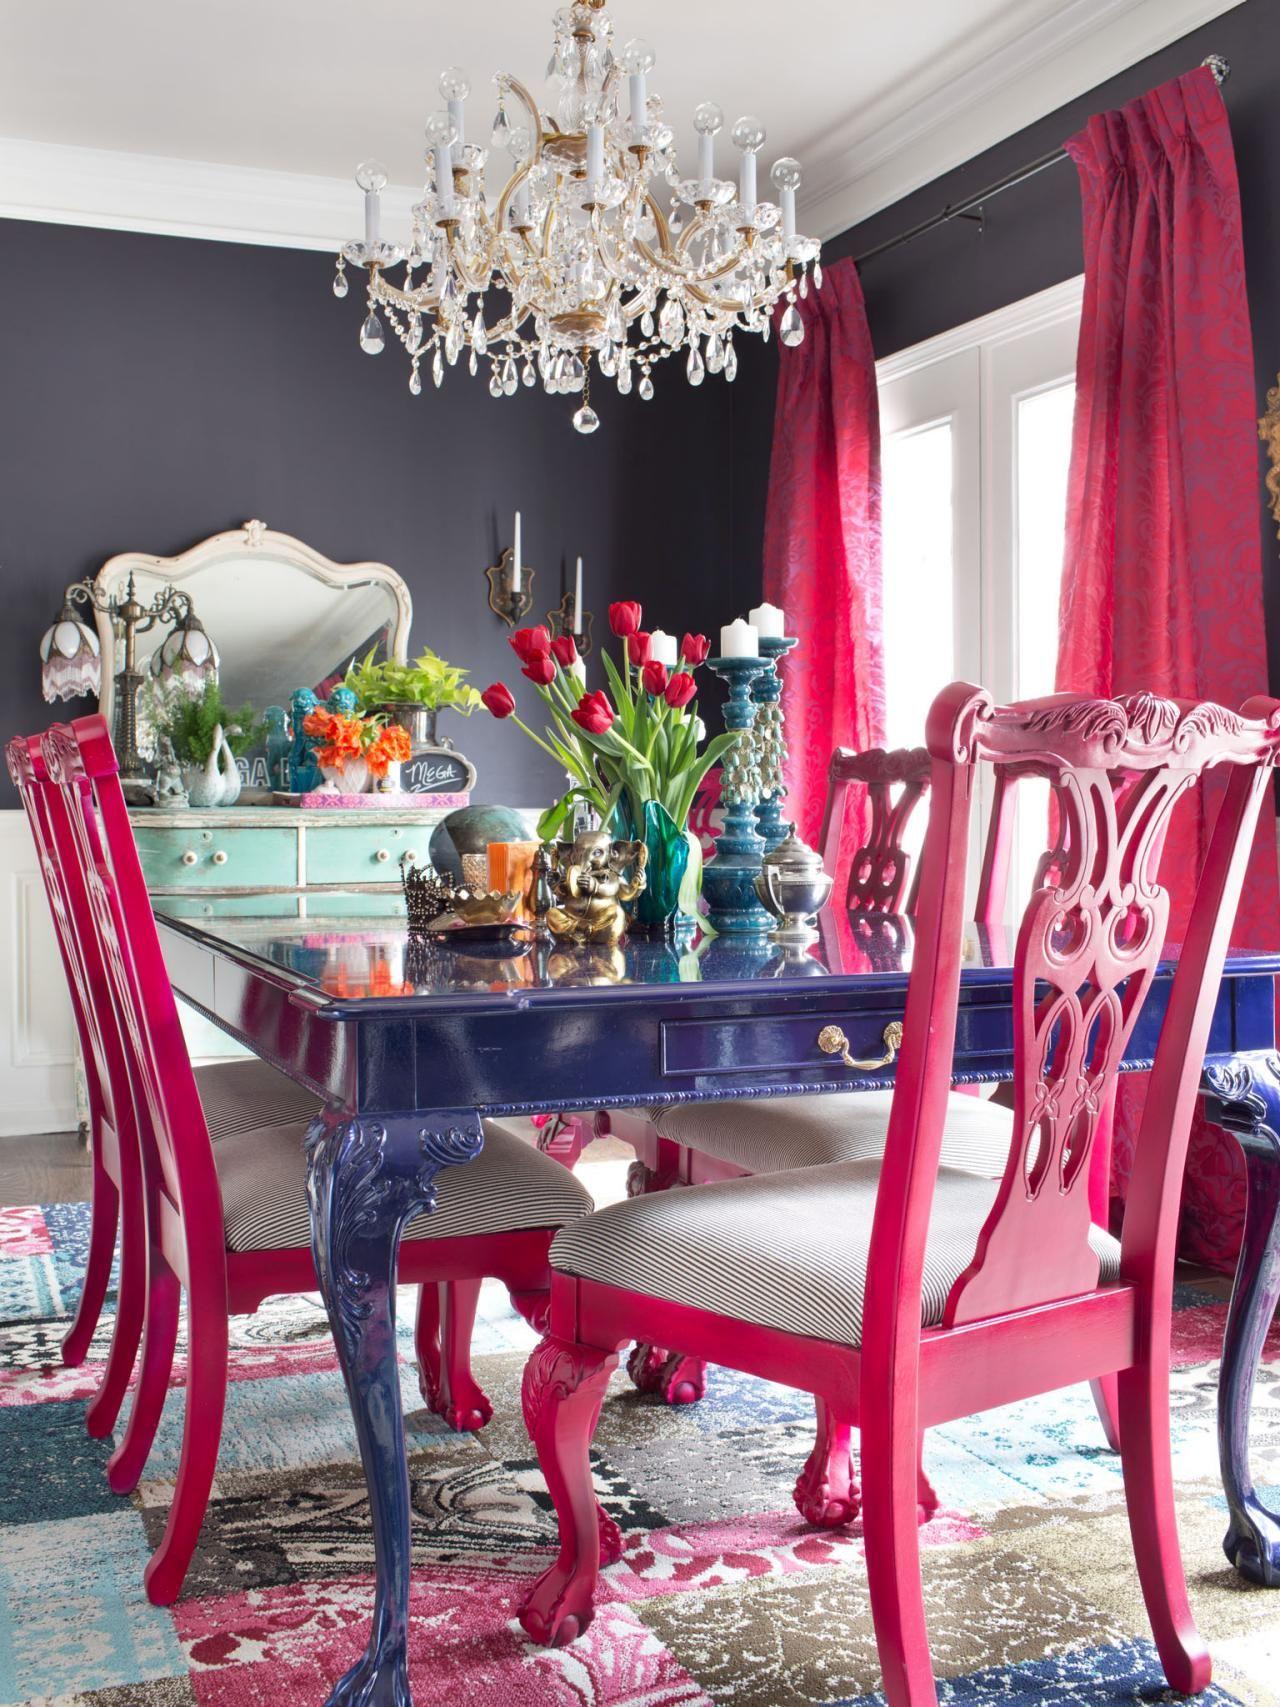 Visit Anitra Mecadon in her personal den